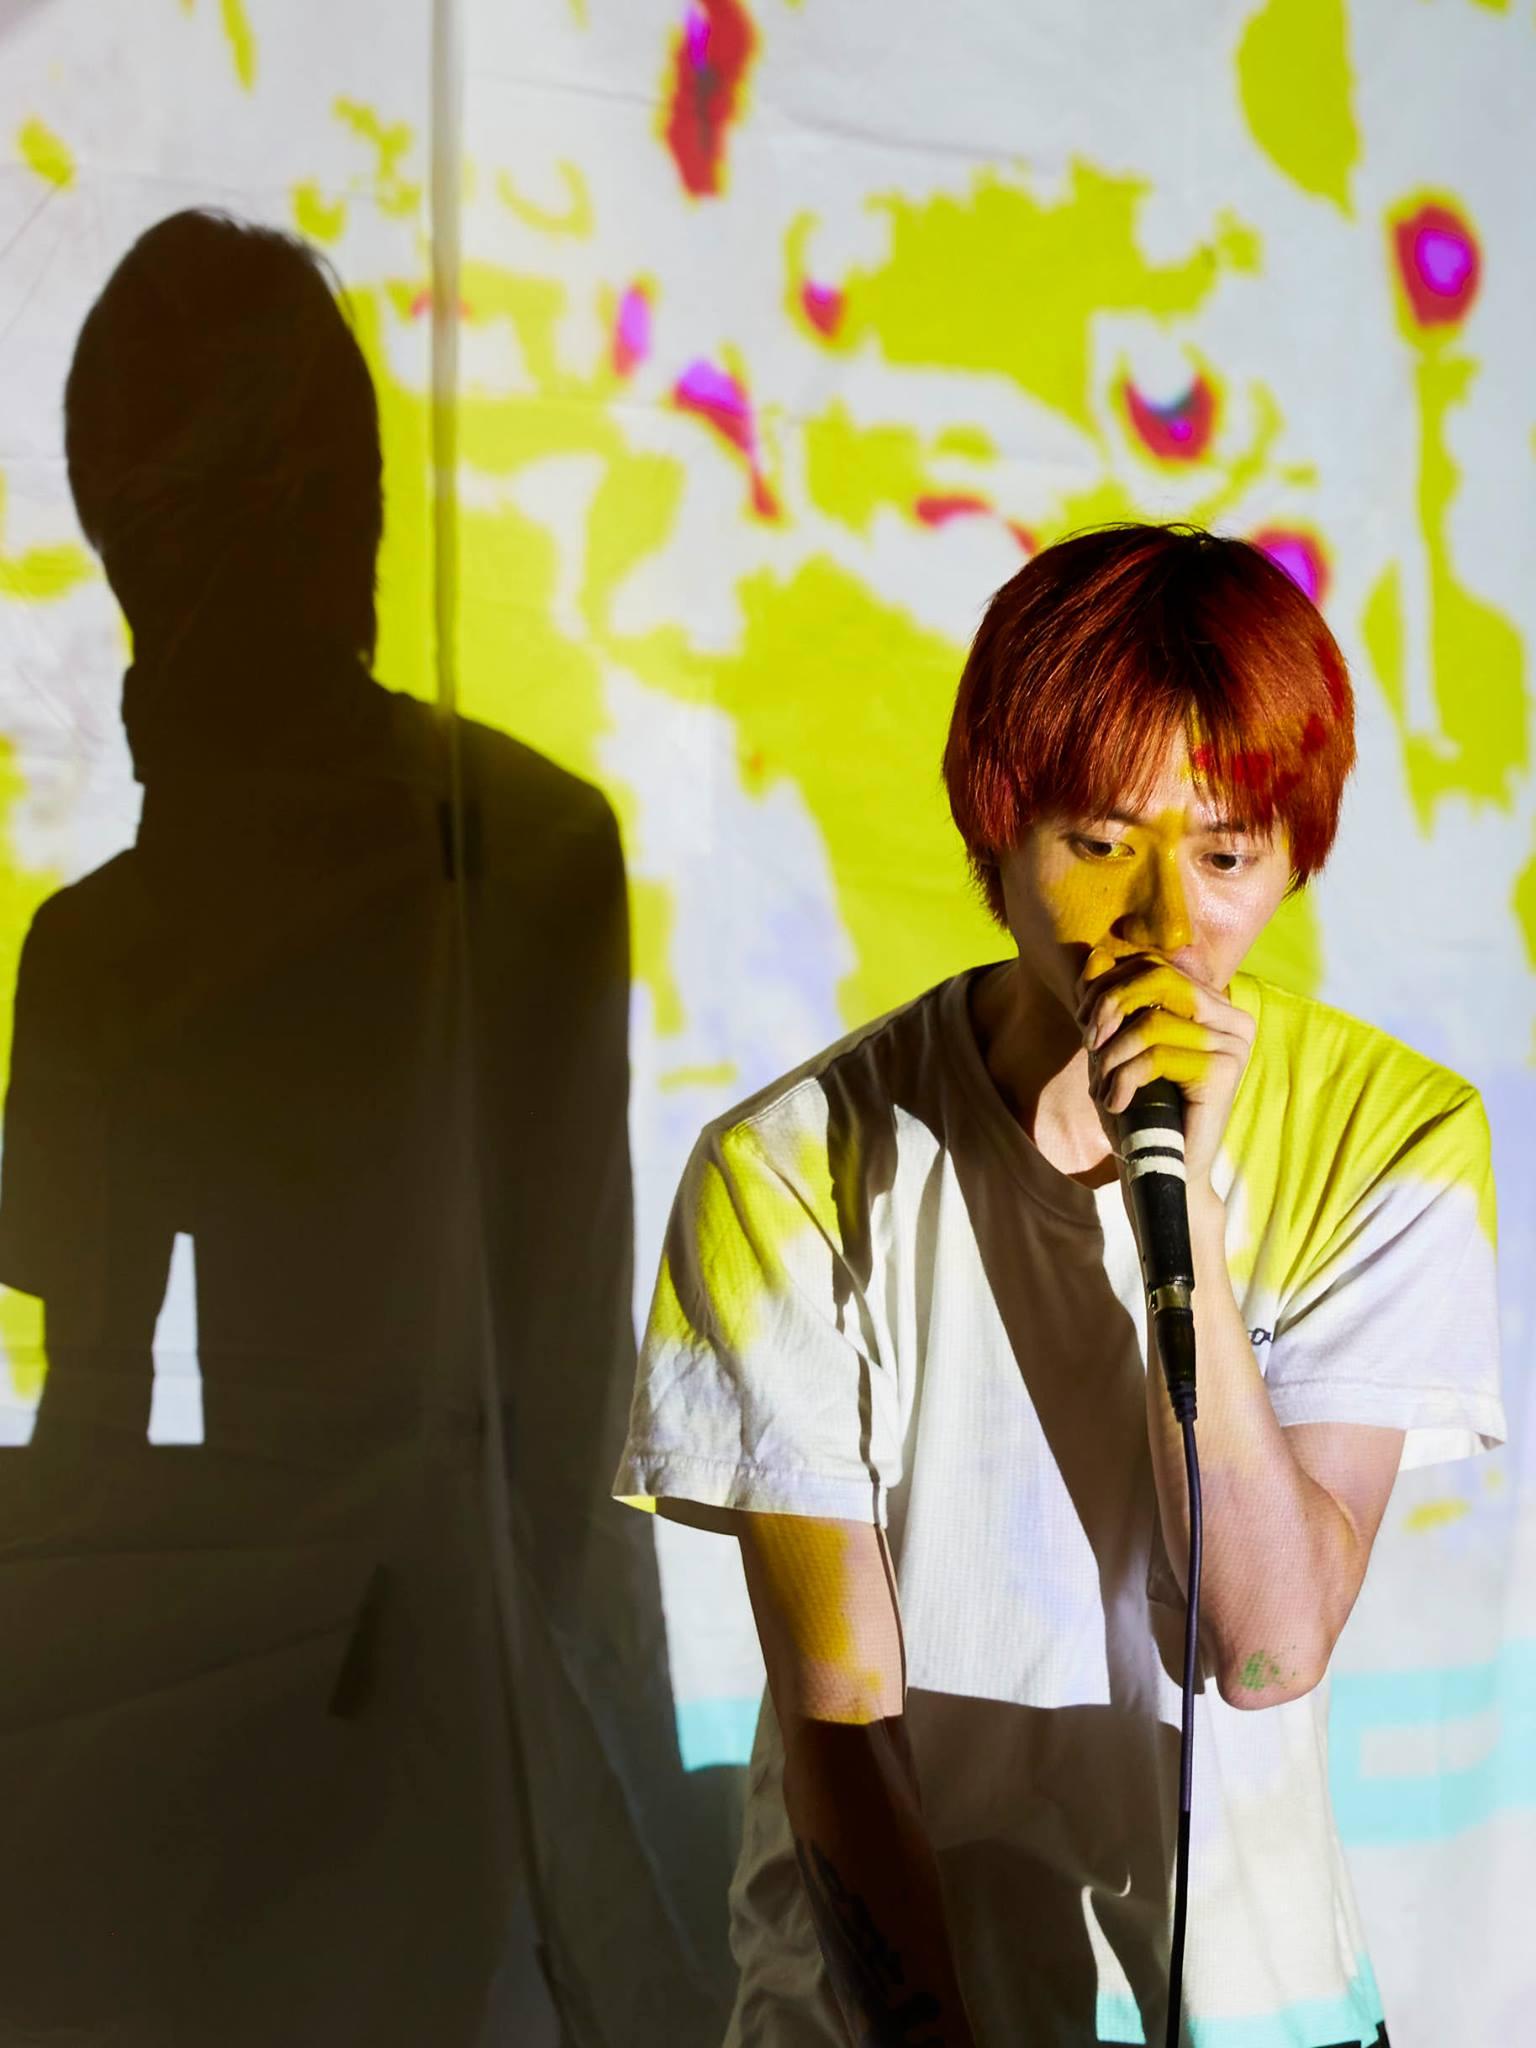 Photograph: Hayato Sakurai